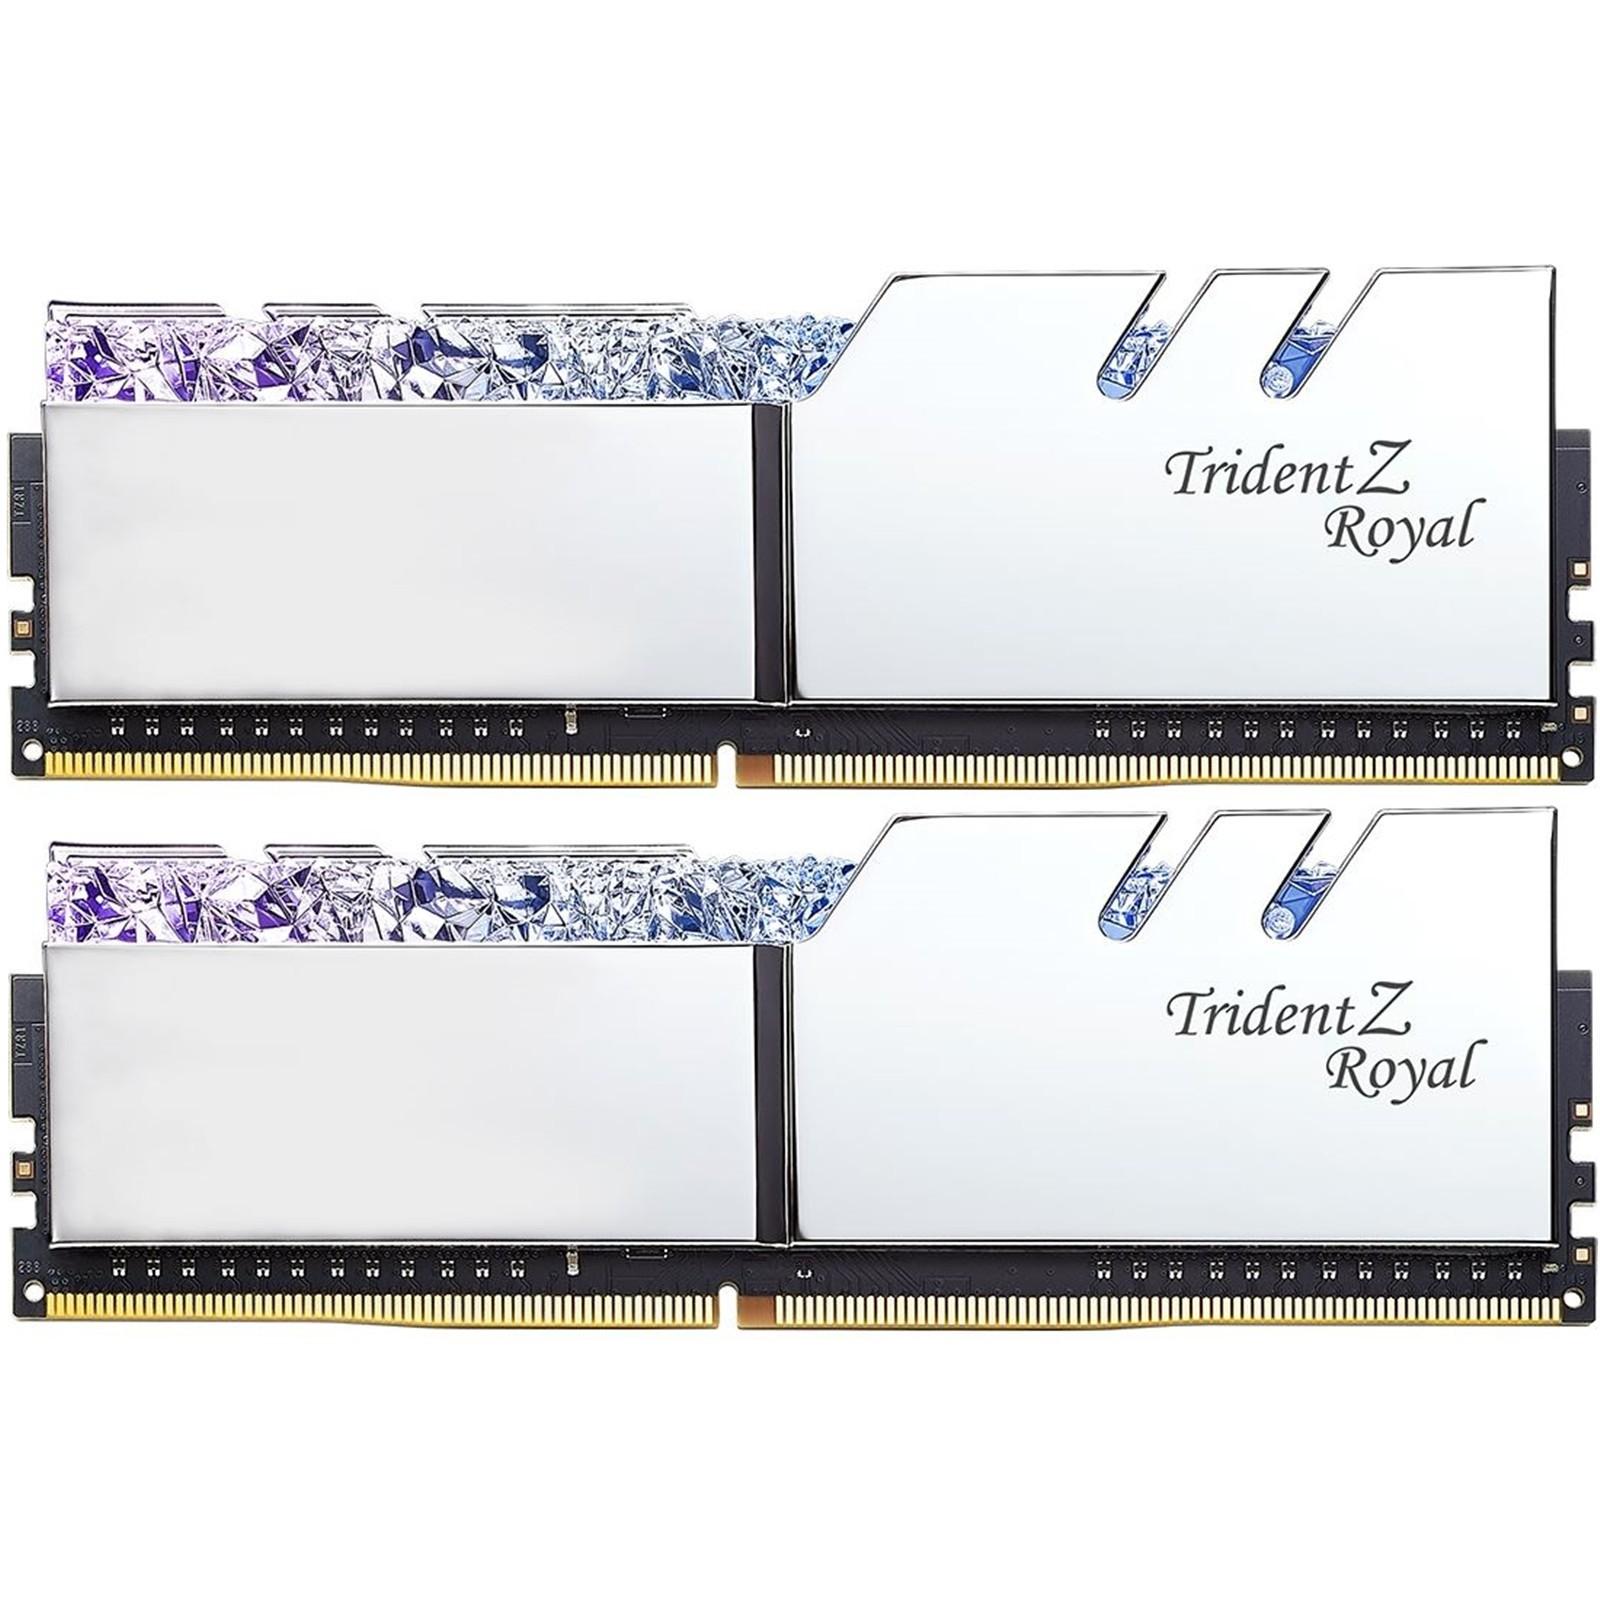 (Pre-Order) G Skill Trident Z Royal RGB 16GB (8GBx2) DDR4 3600MHz Gaming  Desktop/PC RAM (F4-3600C18D-16GTRS)